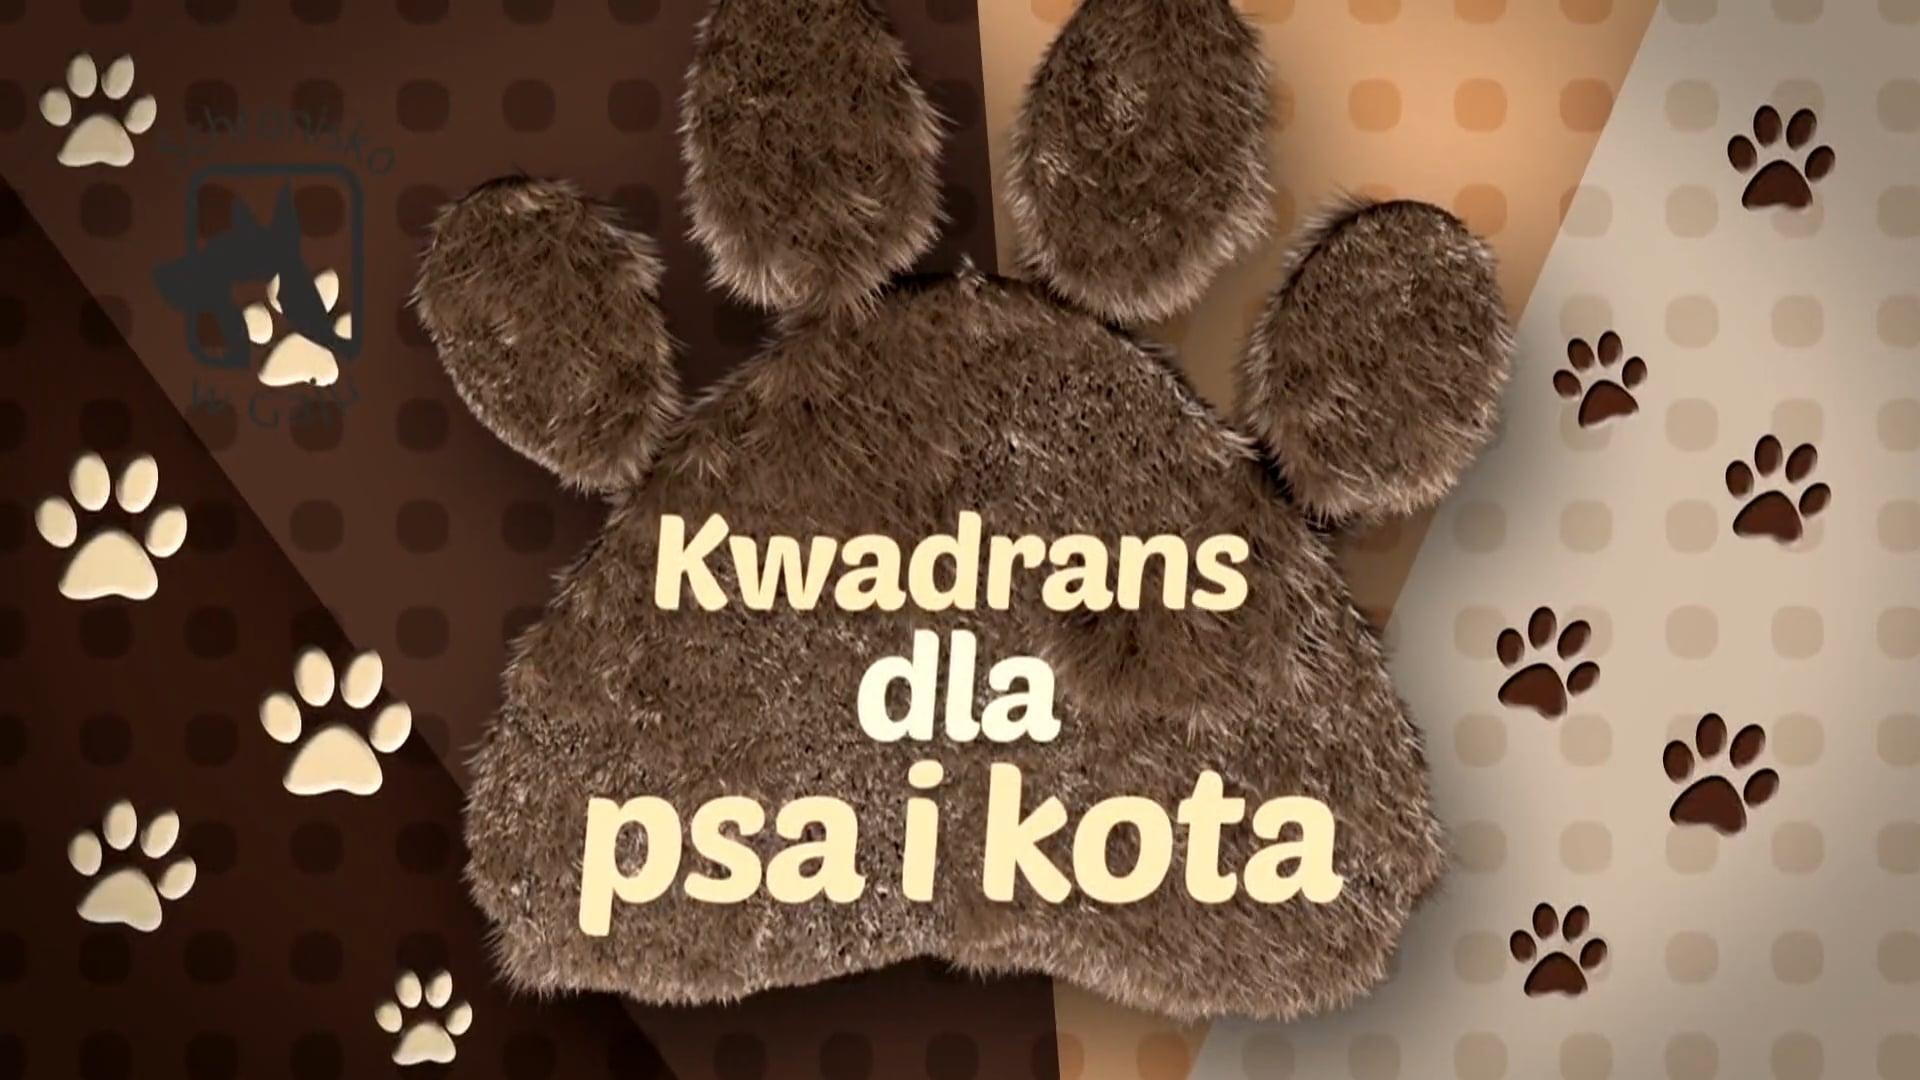 Kwadrans dla psa i kota – odc. 2